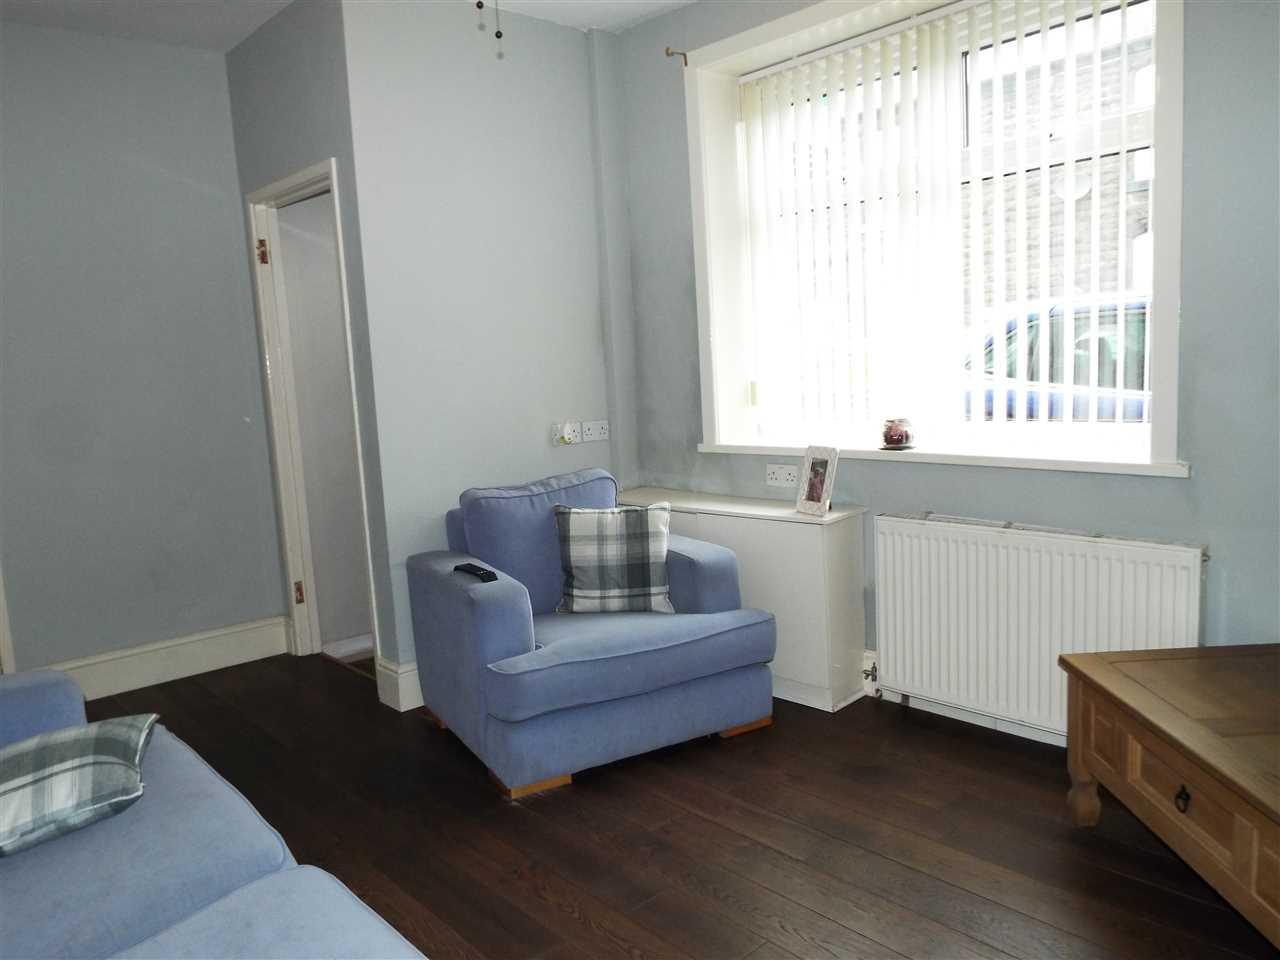 3 bed end-of-terrace for sale in Park Road, Adlington, Adlington 2